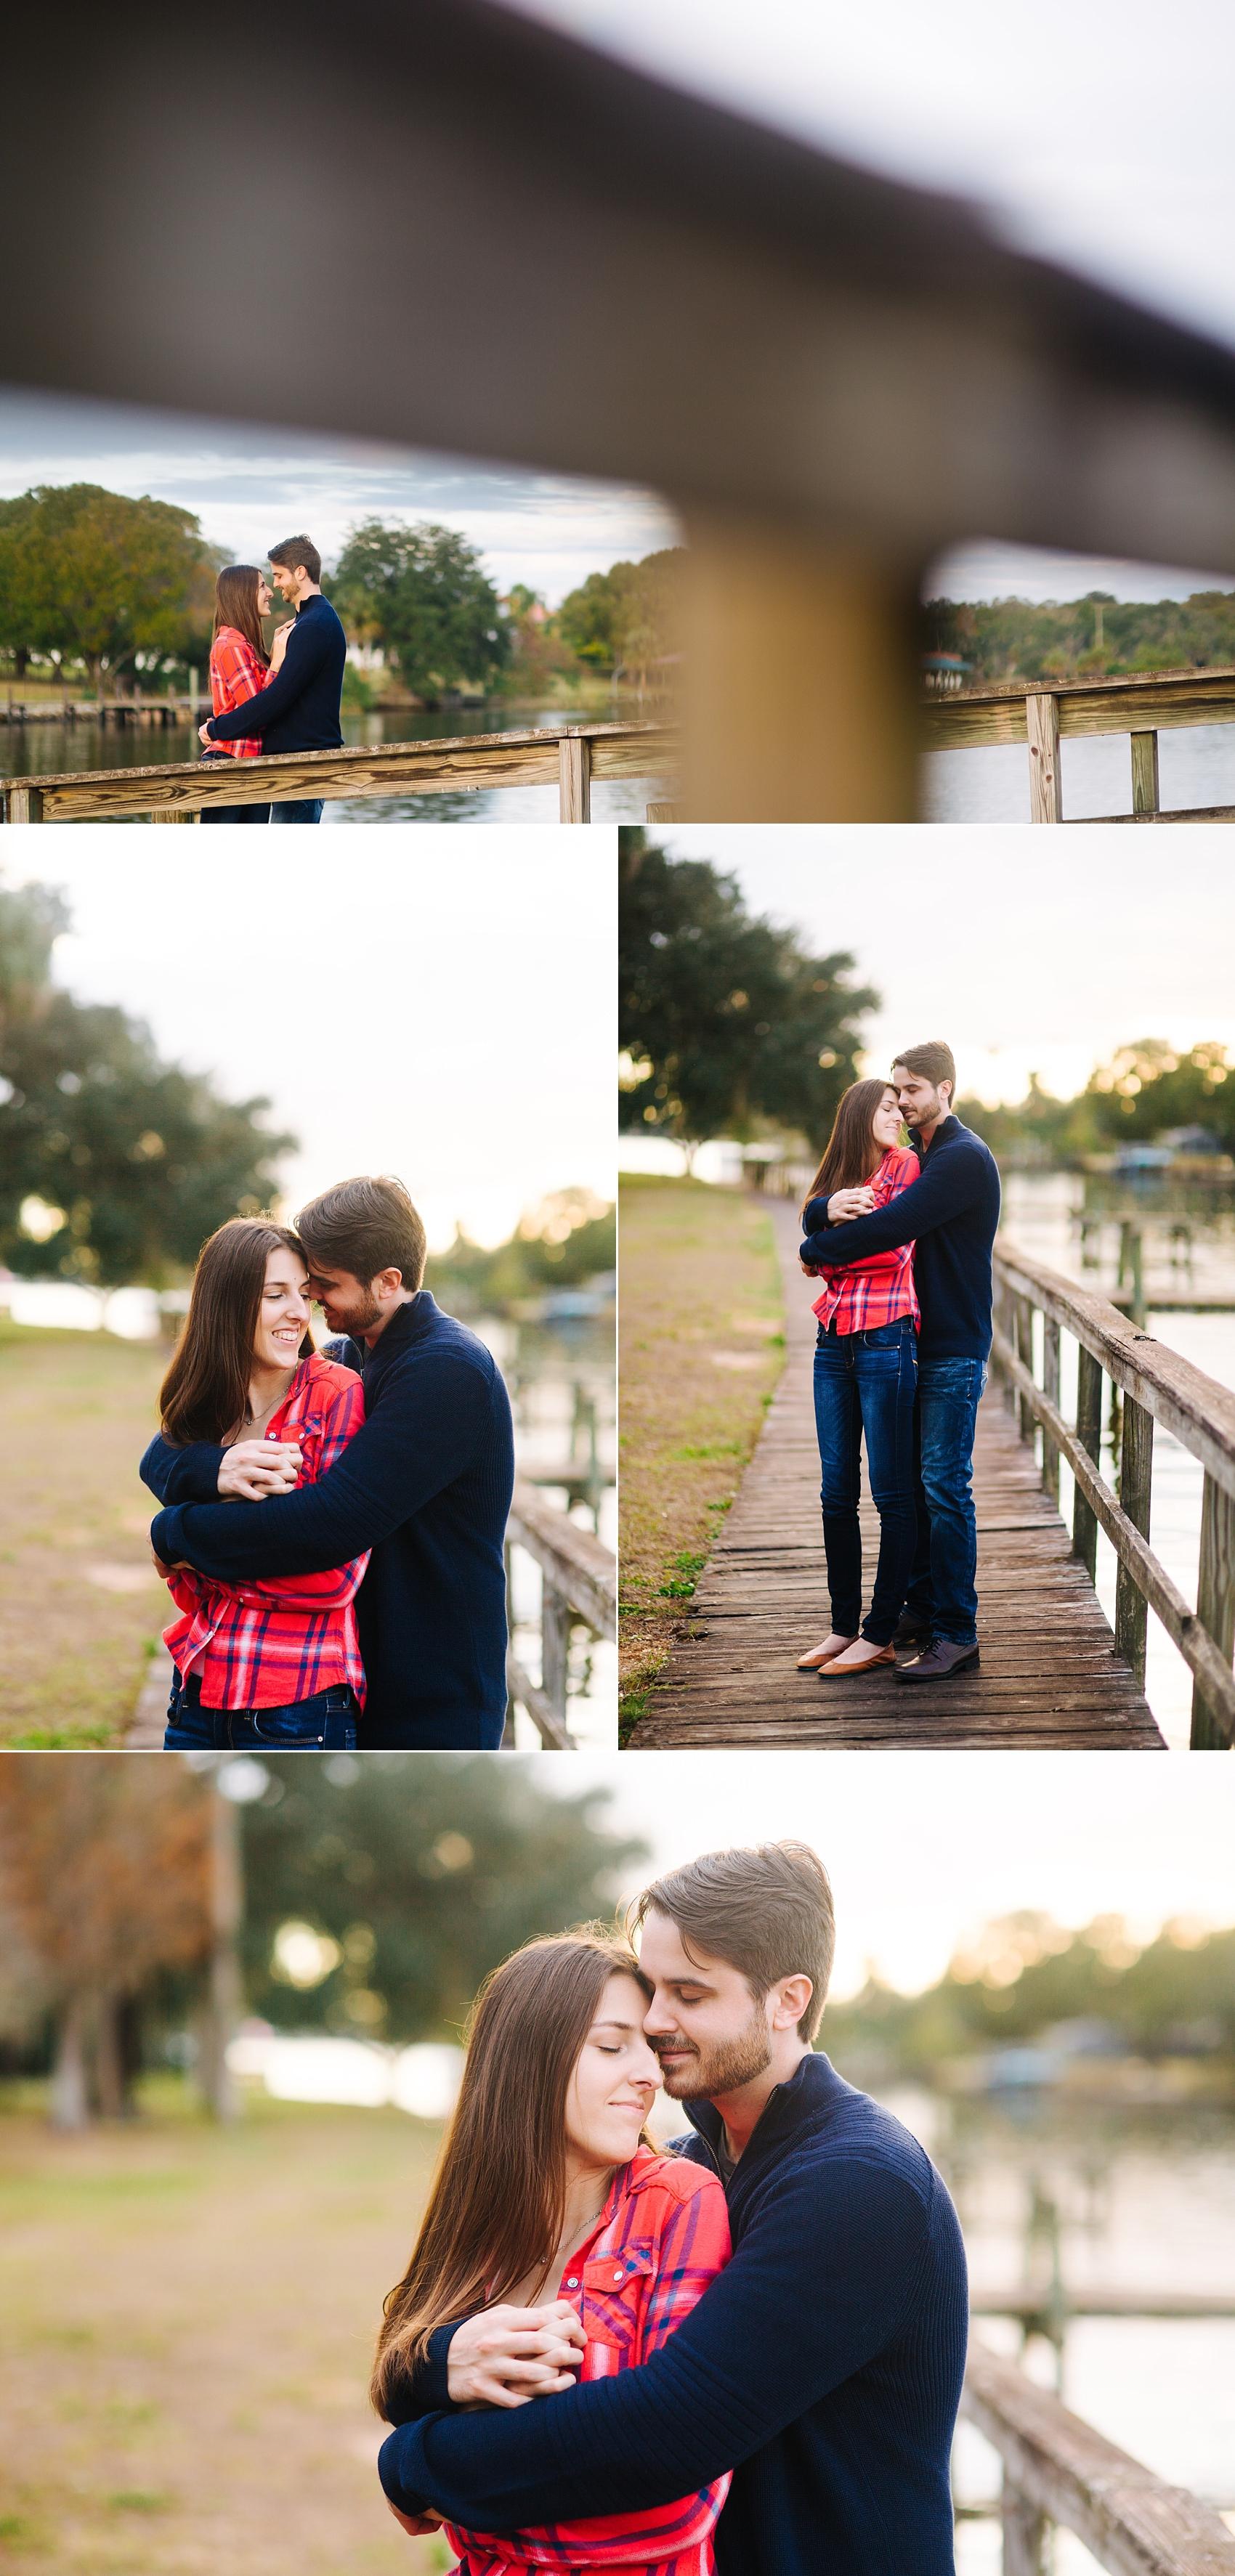 Jake & Katie Photography Seminole Heights Engagement Photos David & Cailyn-012.jpg